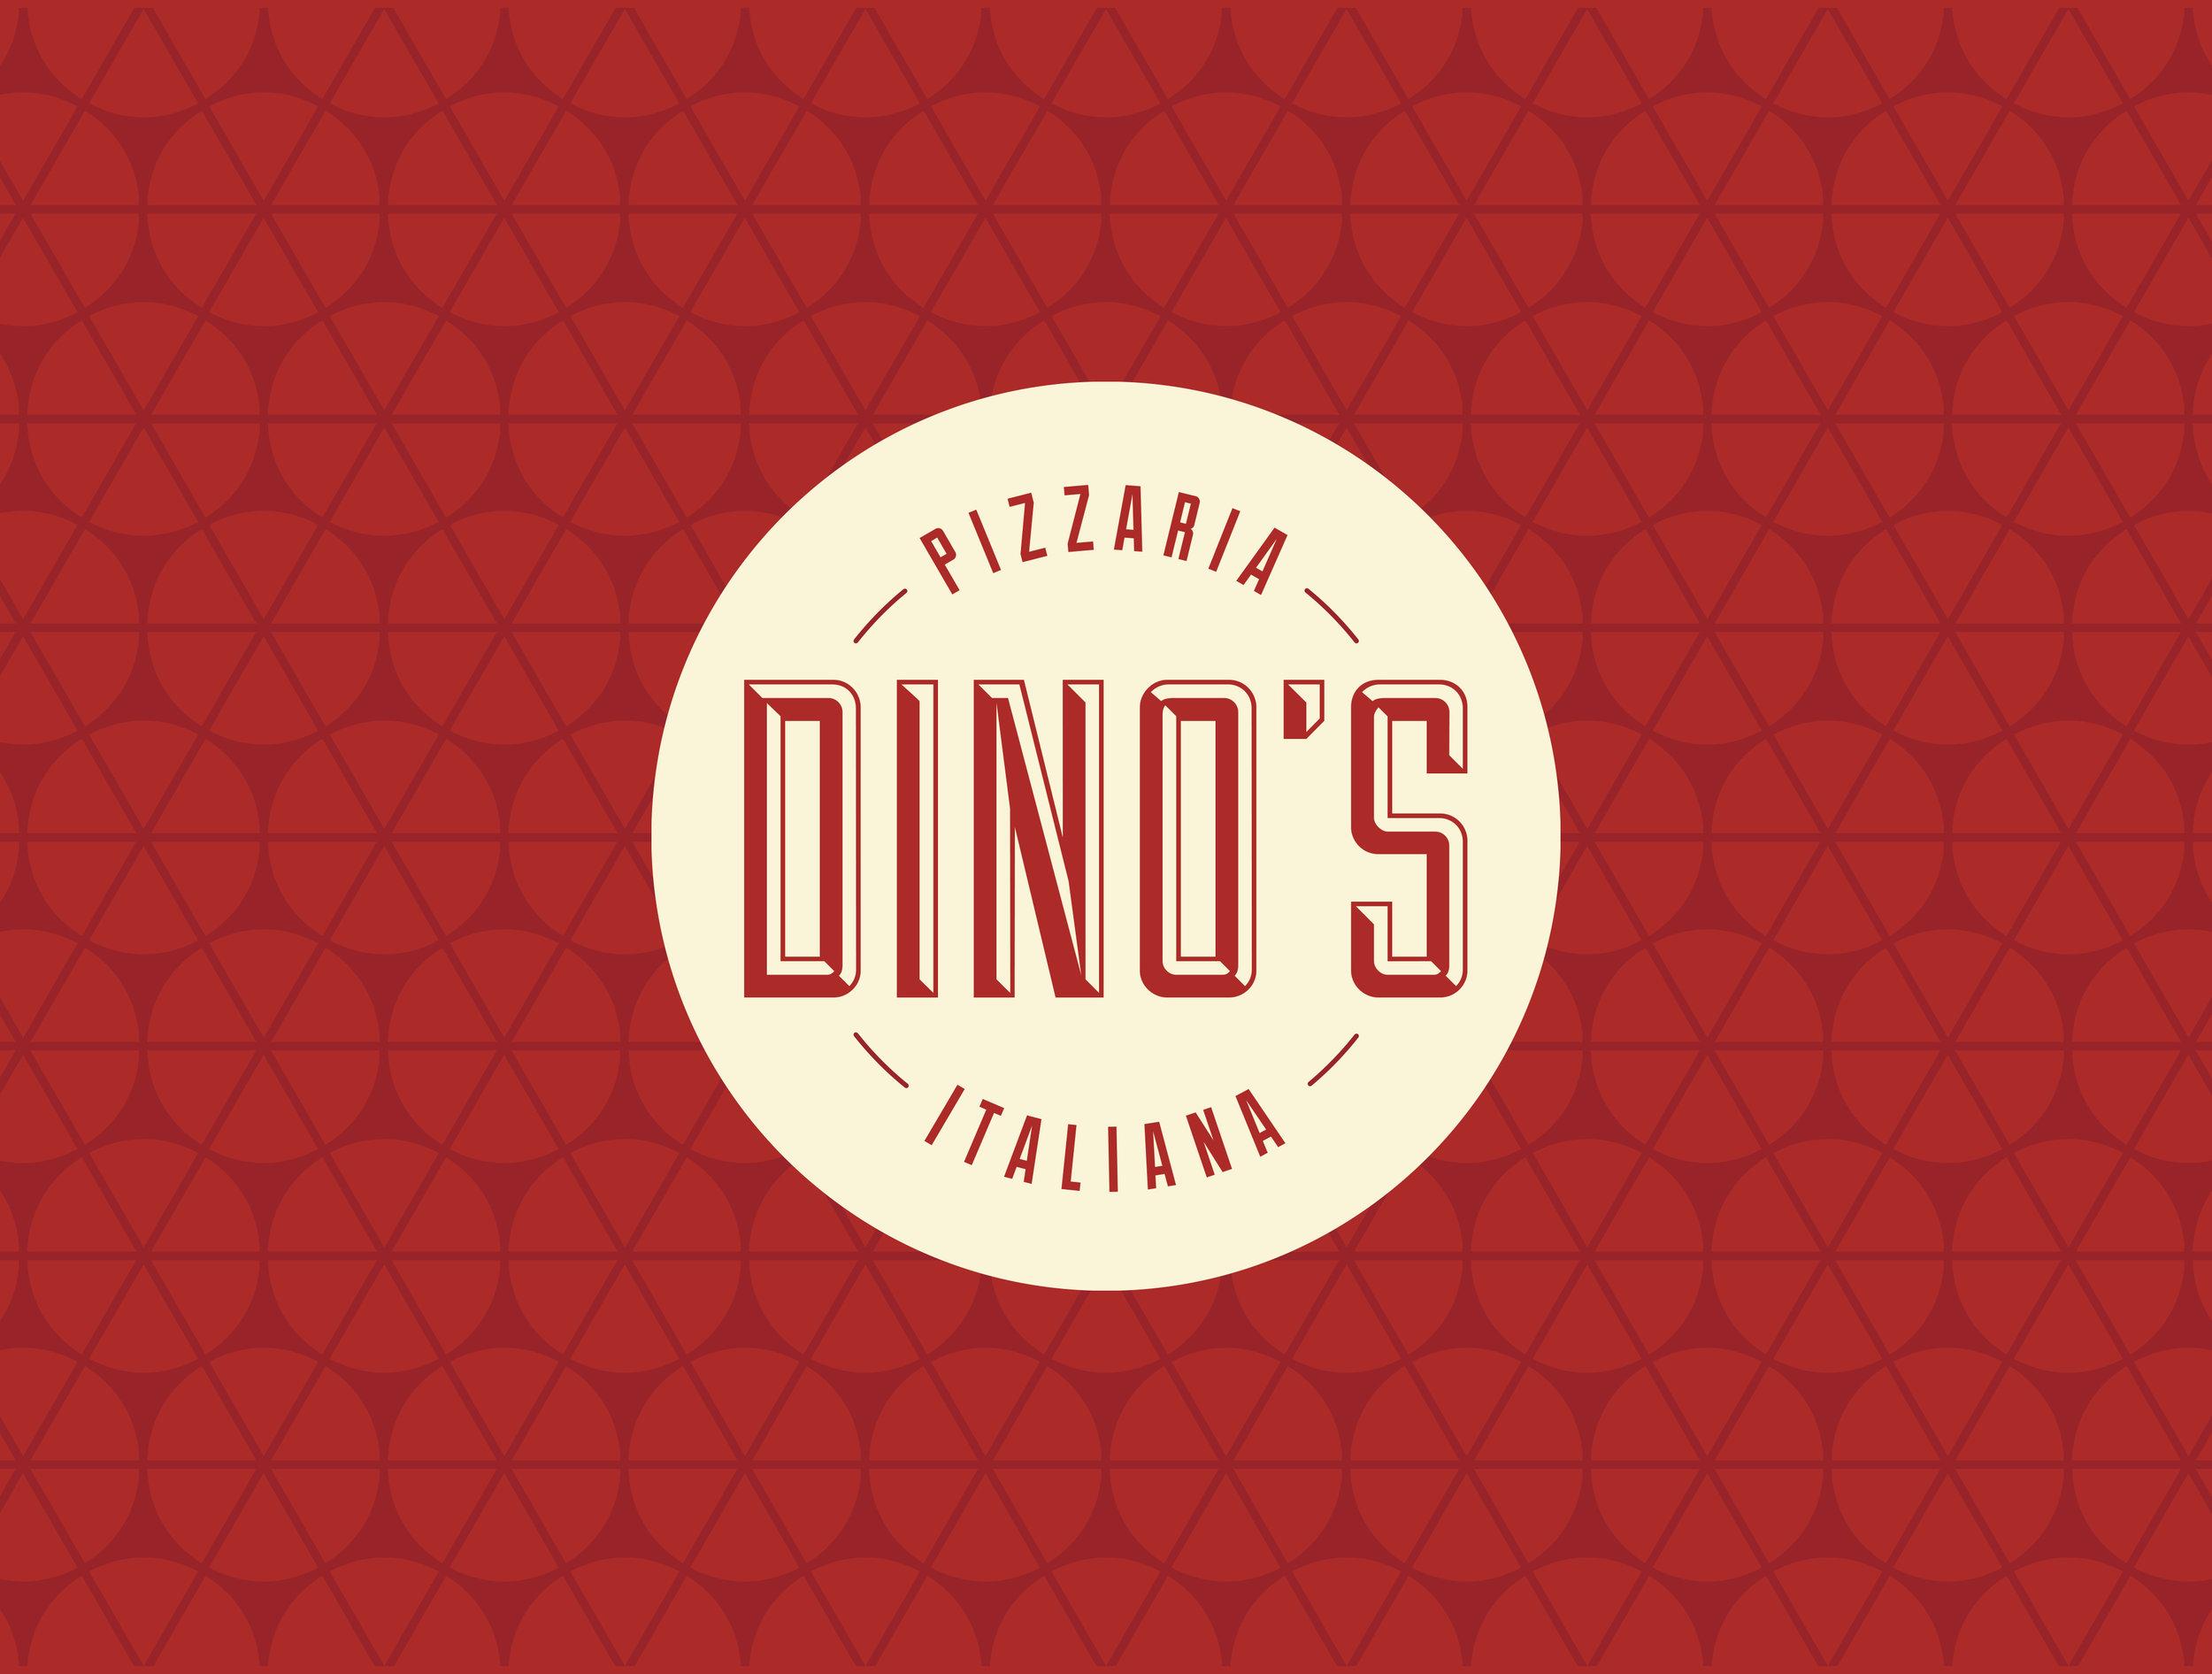 Dino's_logo.JPG